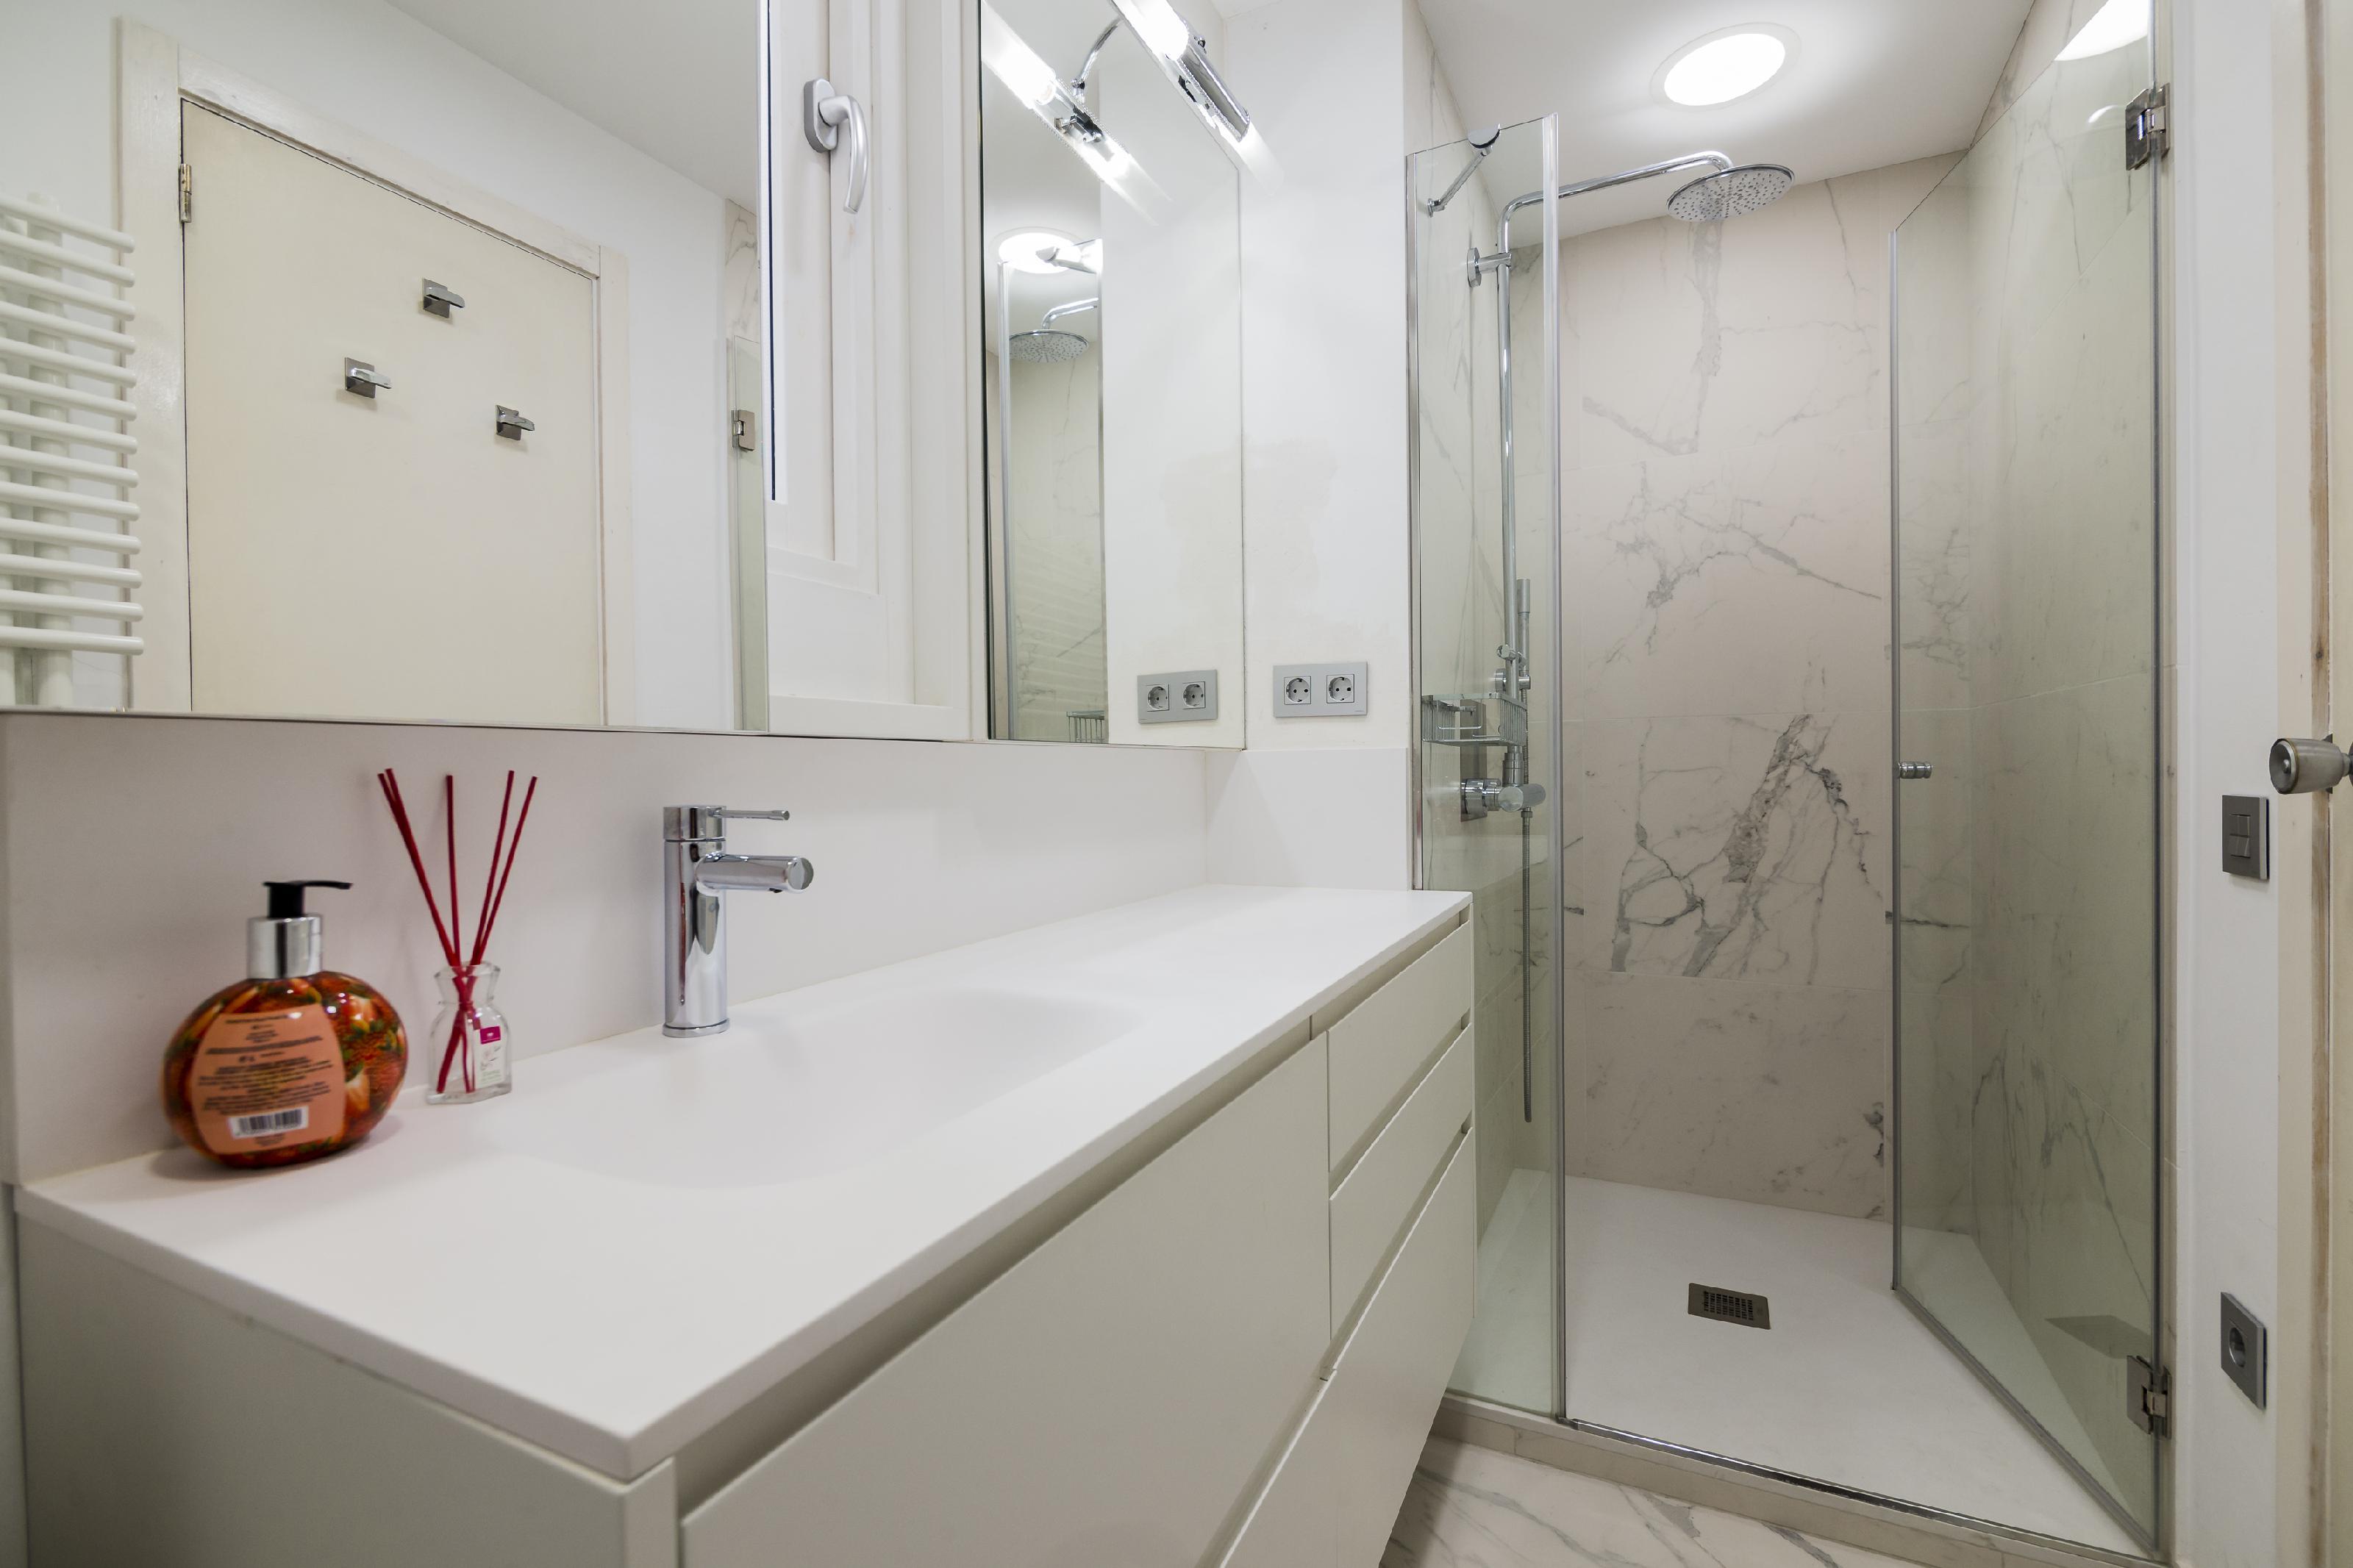 249856 Flat for sale in Sarrià-Sant Gervasi, Sant Gervasi-Galvany 27